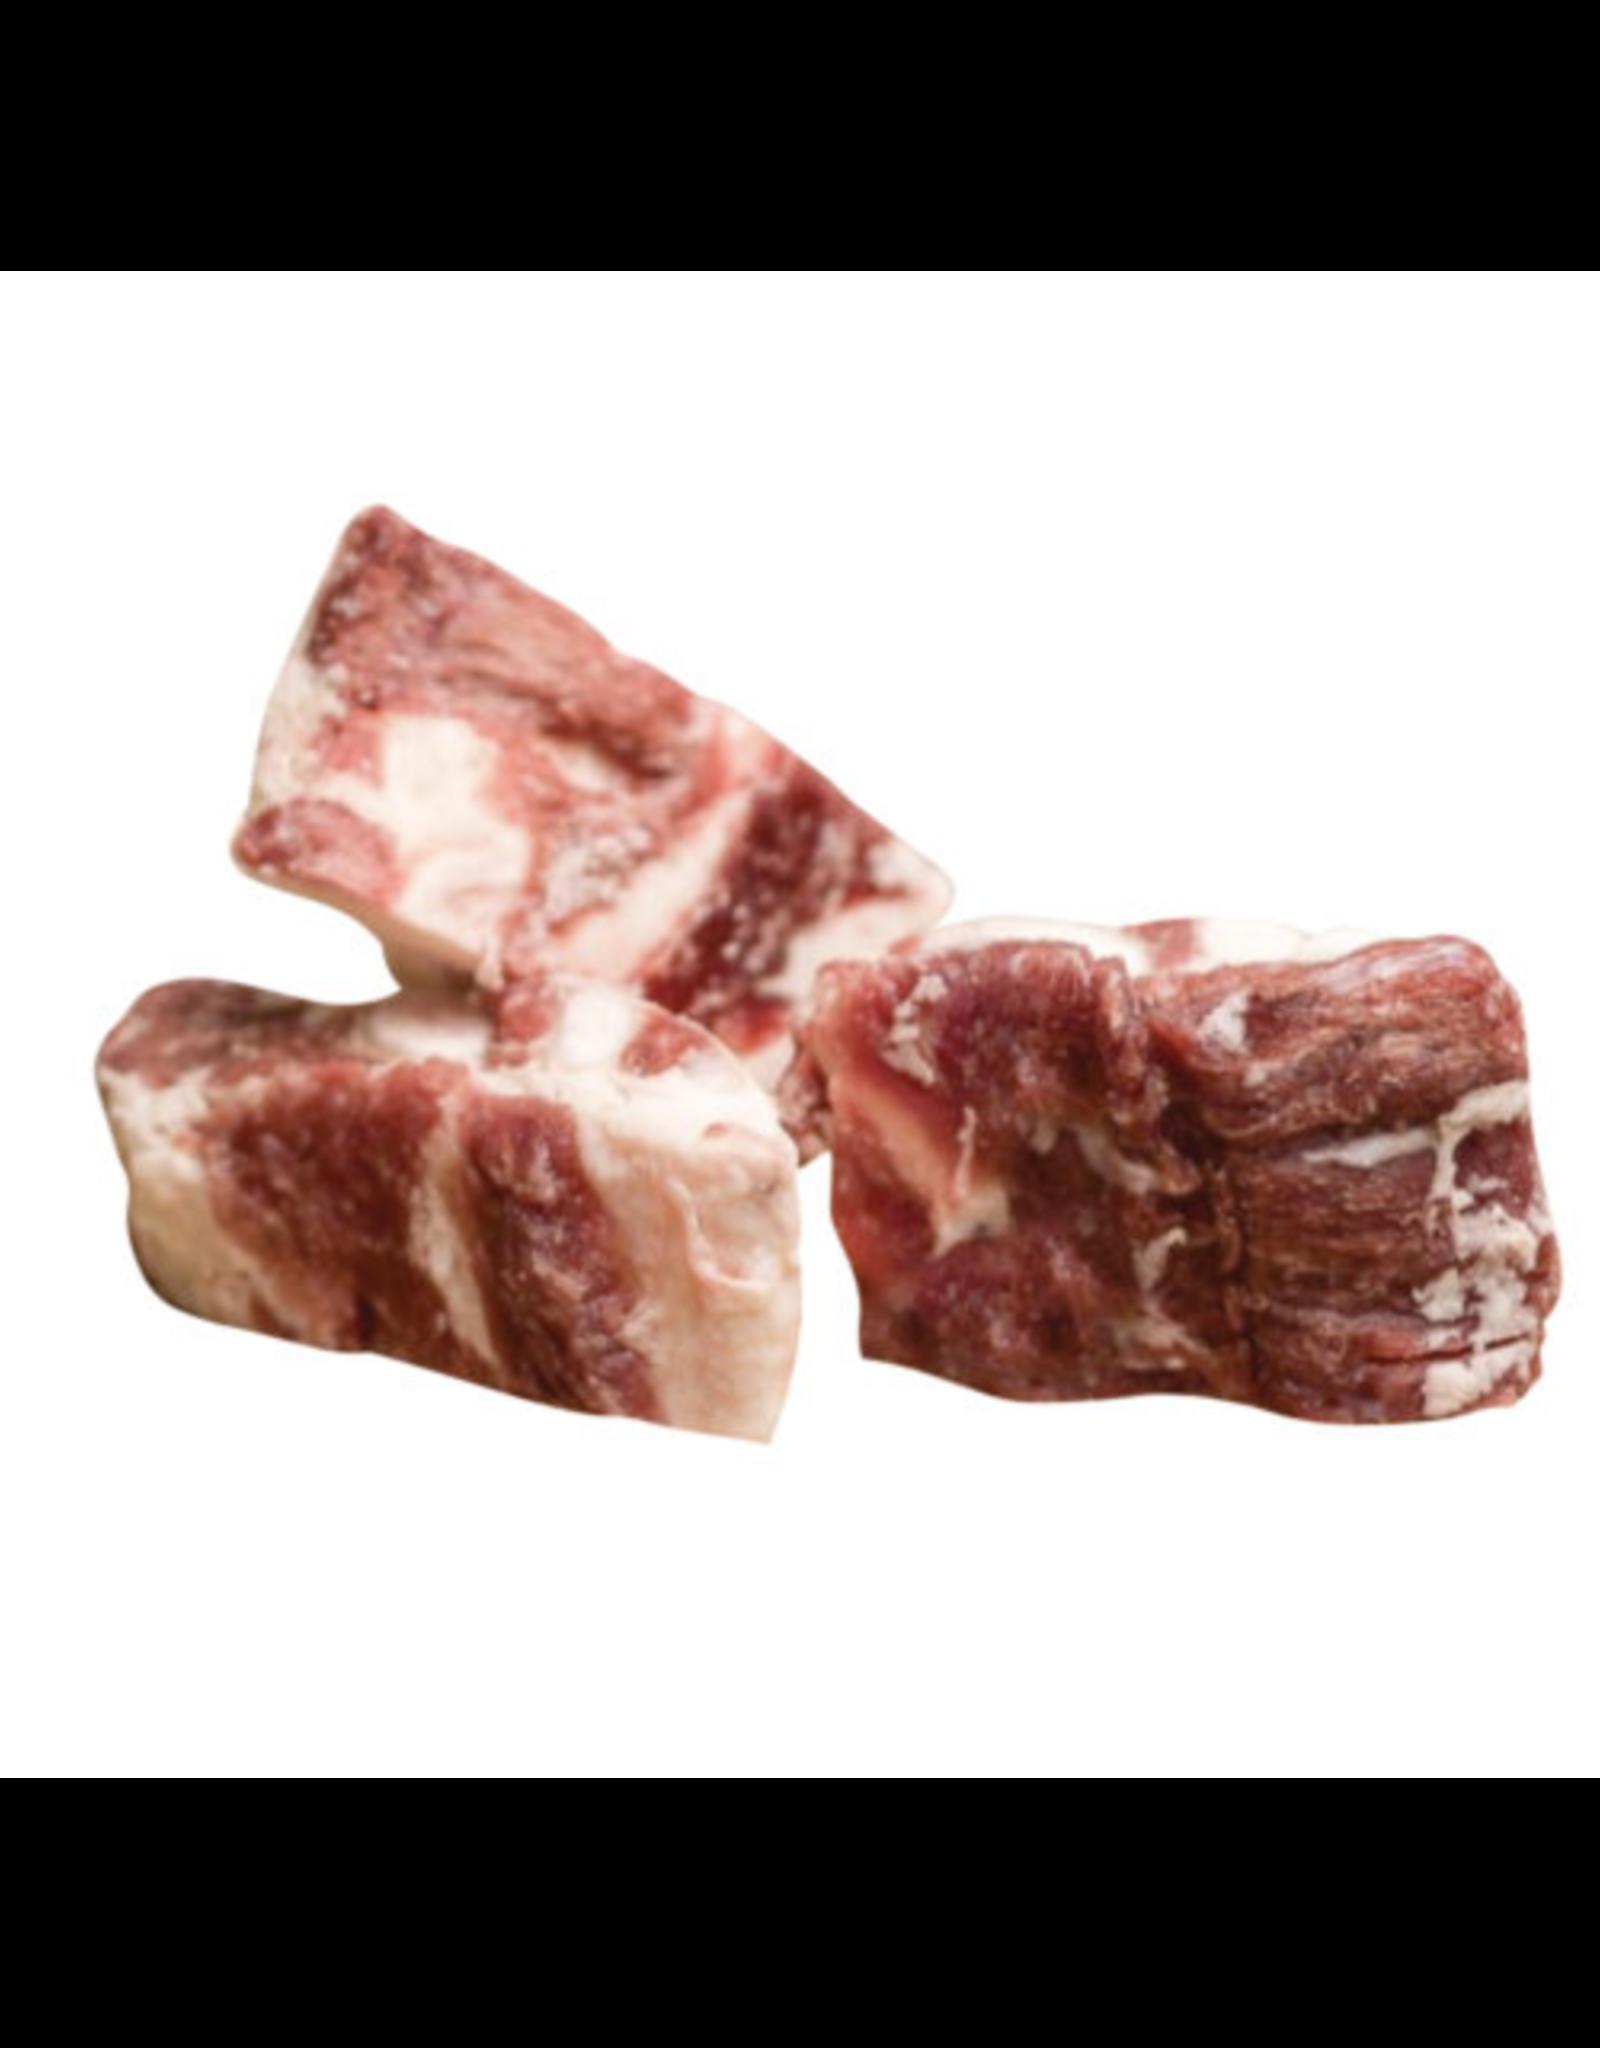 BCR BCR - Pork Riblet (Meaty Pork Bone) 1lb